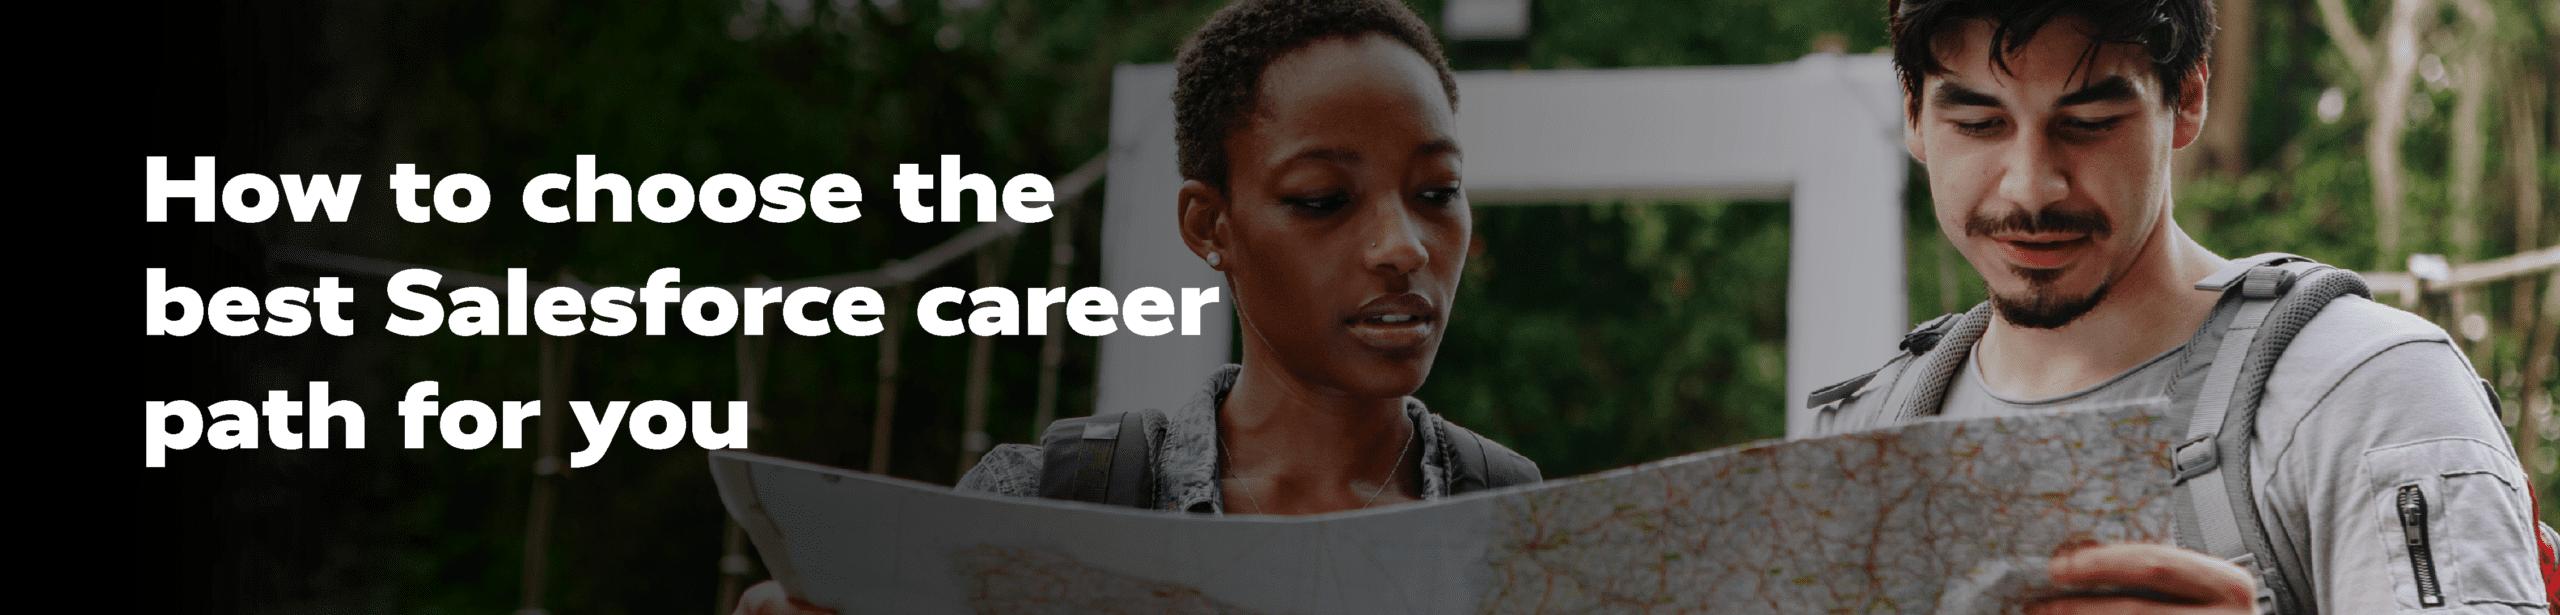 Salesforce Career Path-Hero image